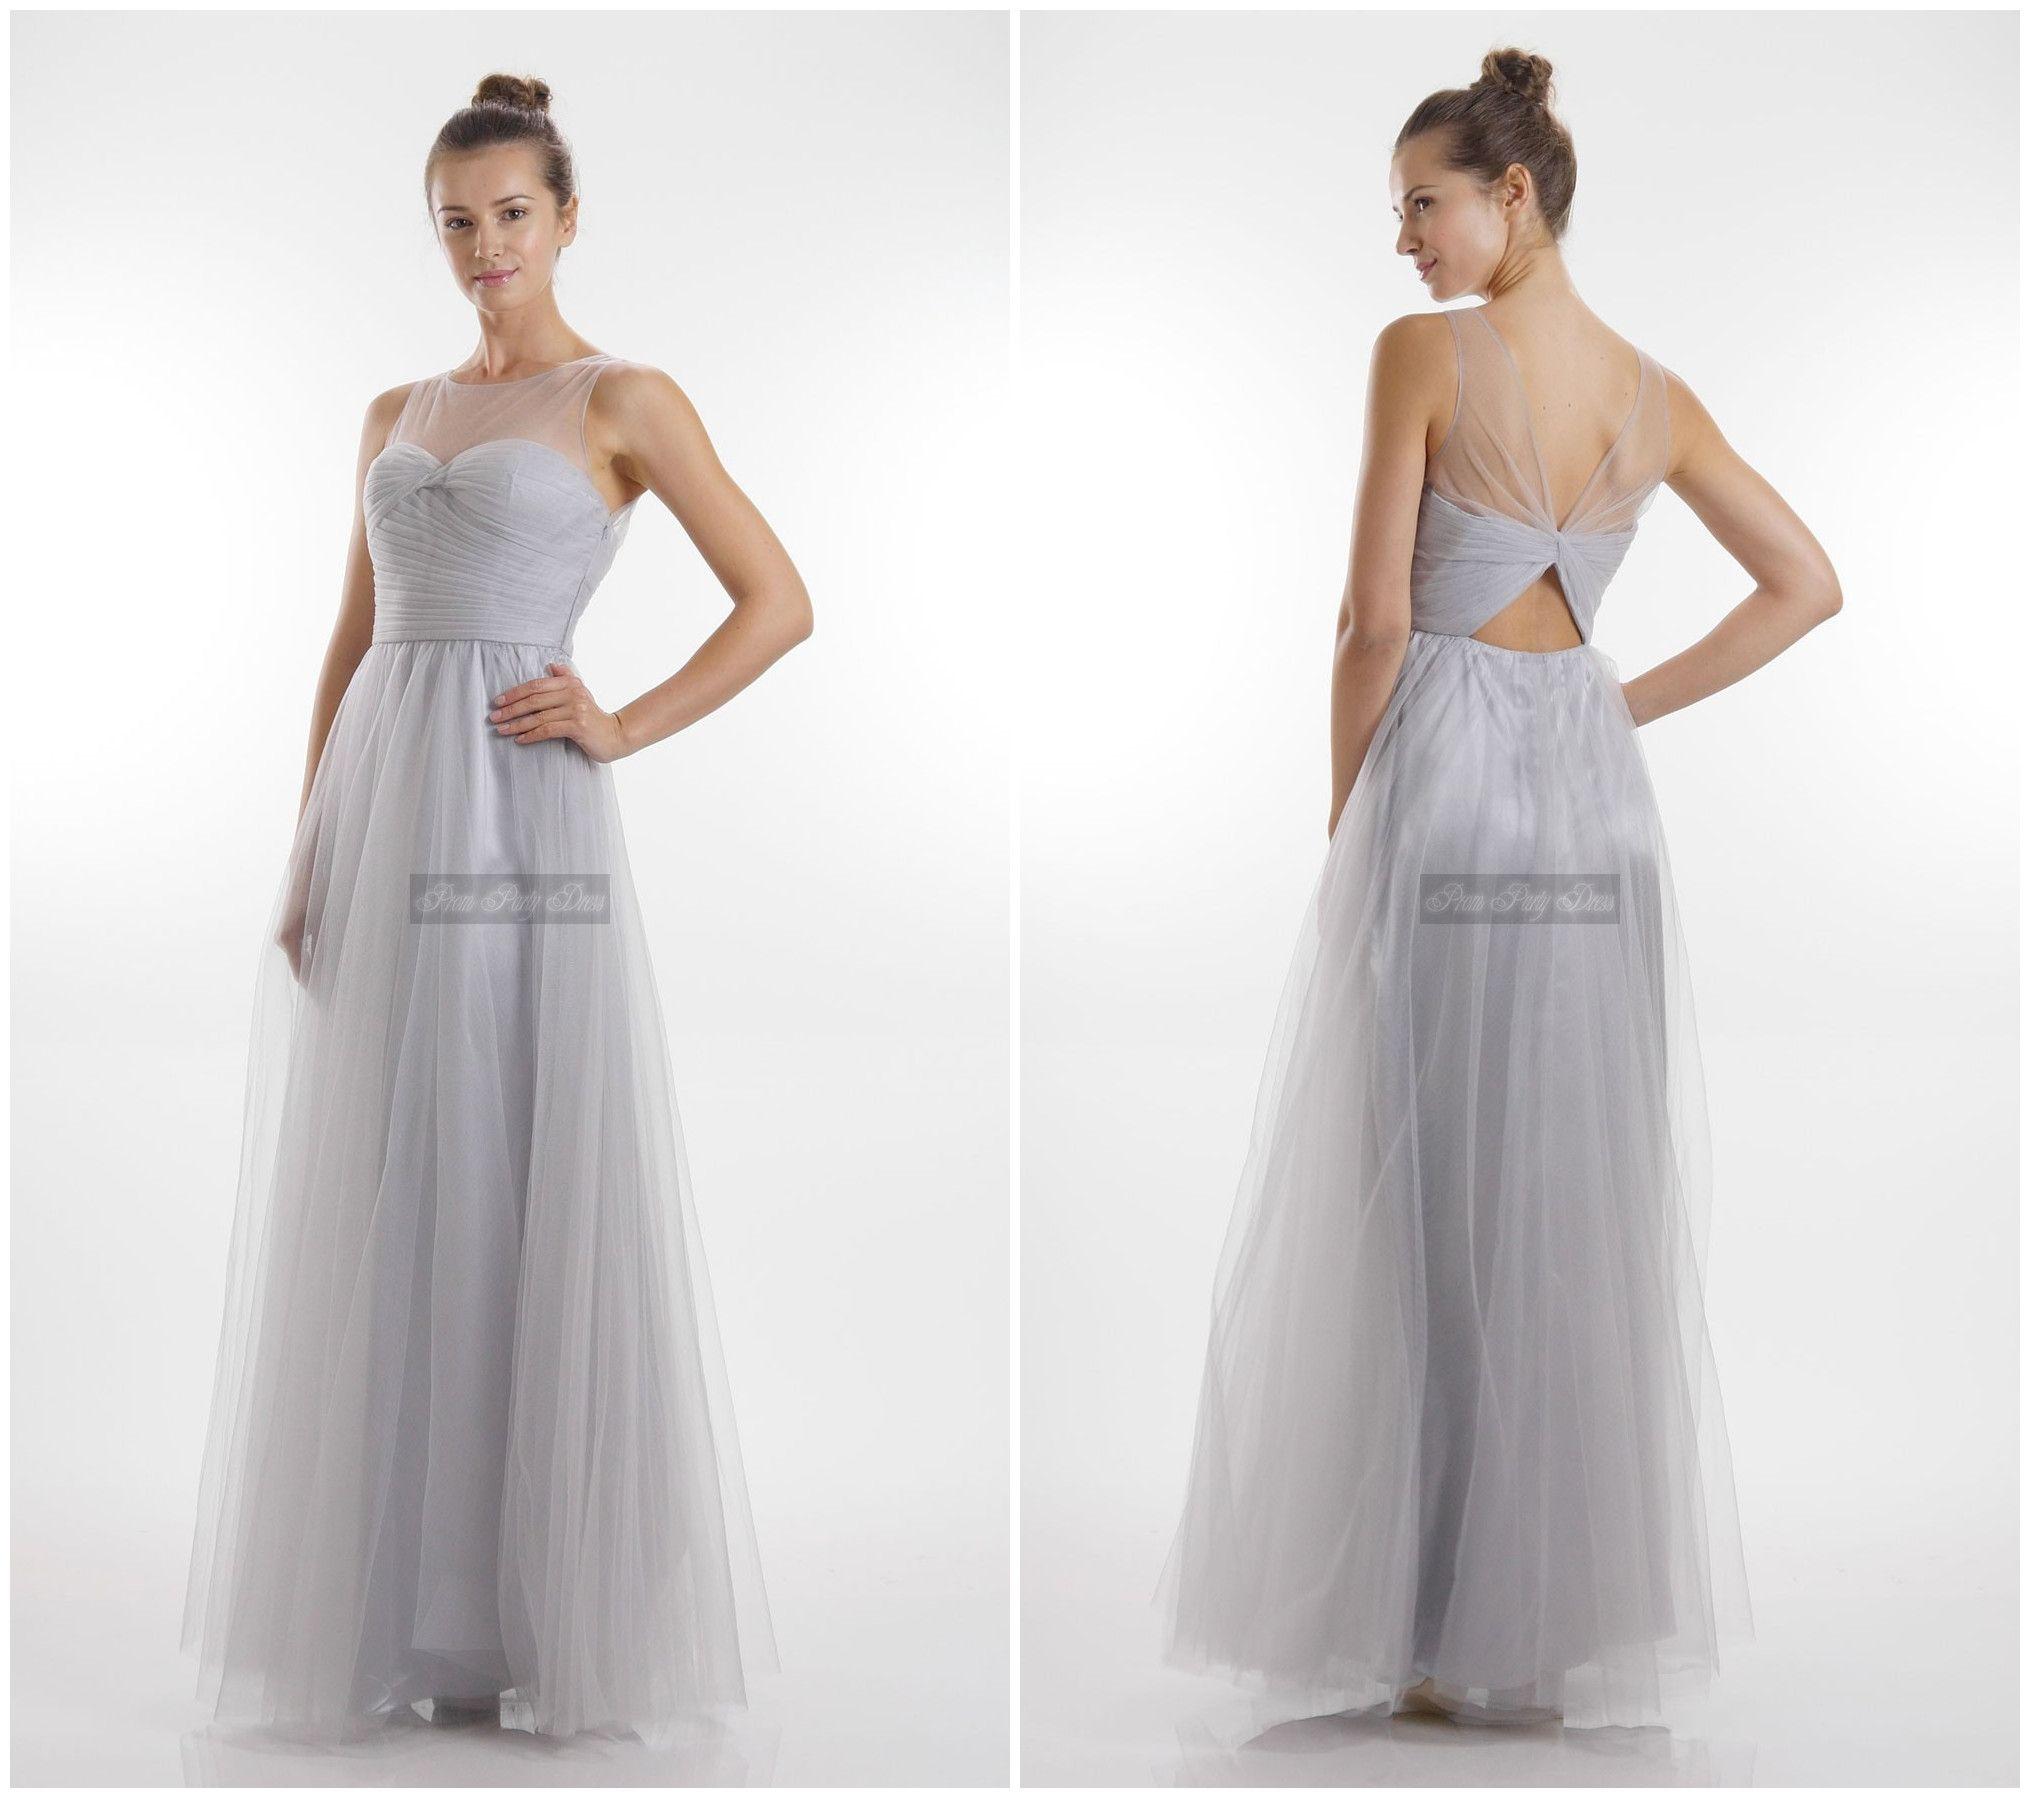 Luxury Indie Prom Dress Crest - Colorful Wedding Dress Ideas ...